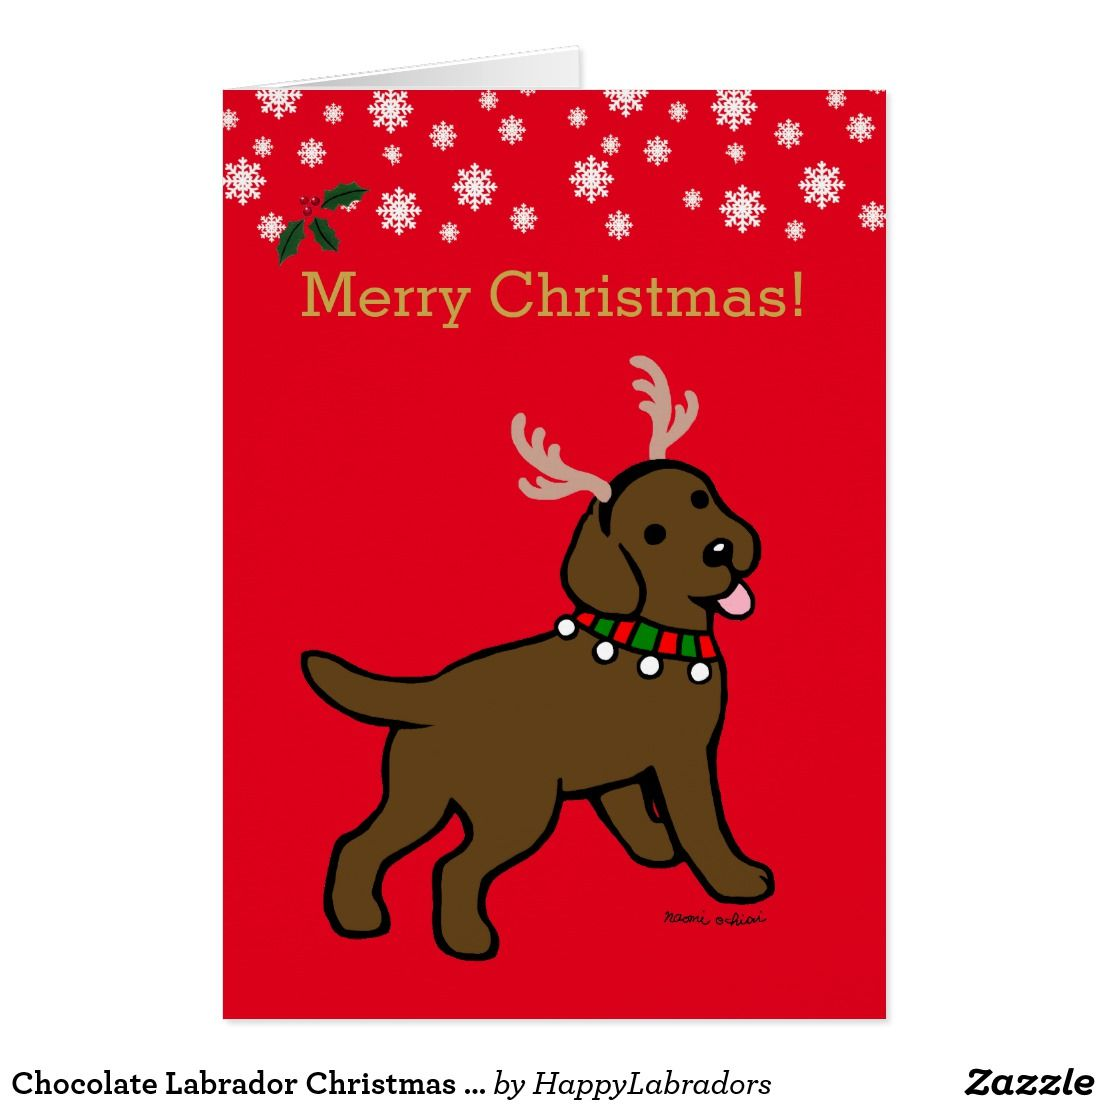 Chocolate Labrador Christmas Antlers Holiday Card   CHOCOLATE LAB ...